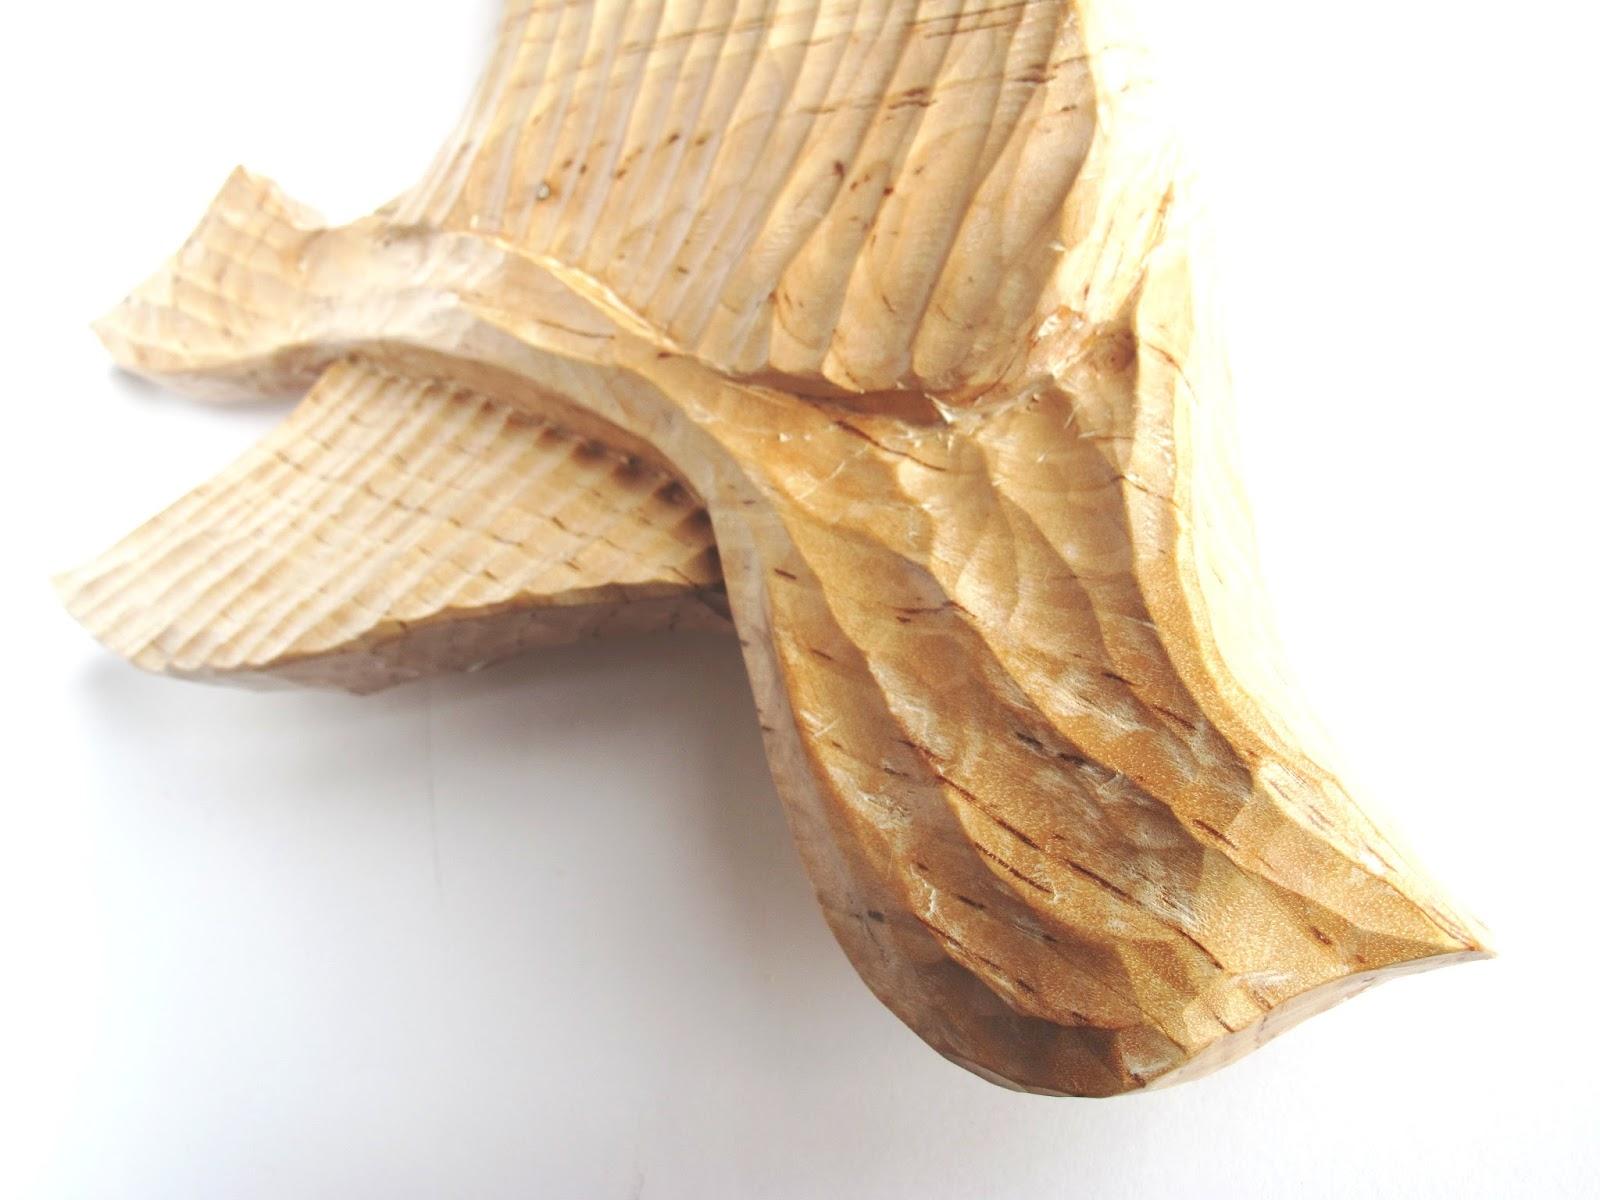 Paloma tallada ilex talla taller de talla de madera - Madera de abedul ...